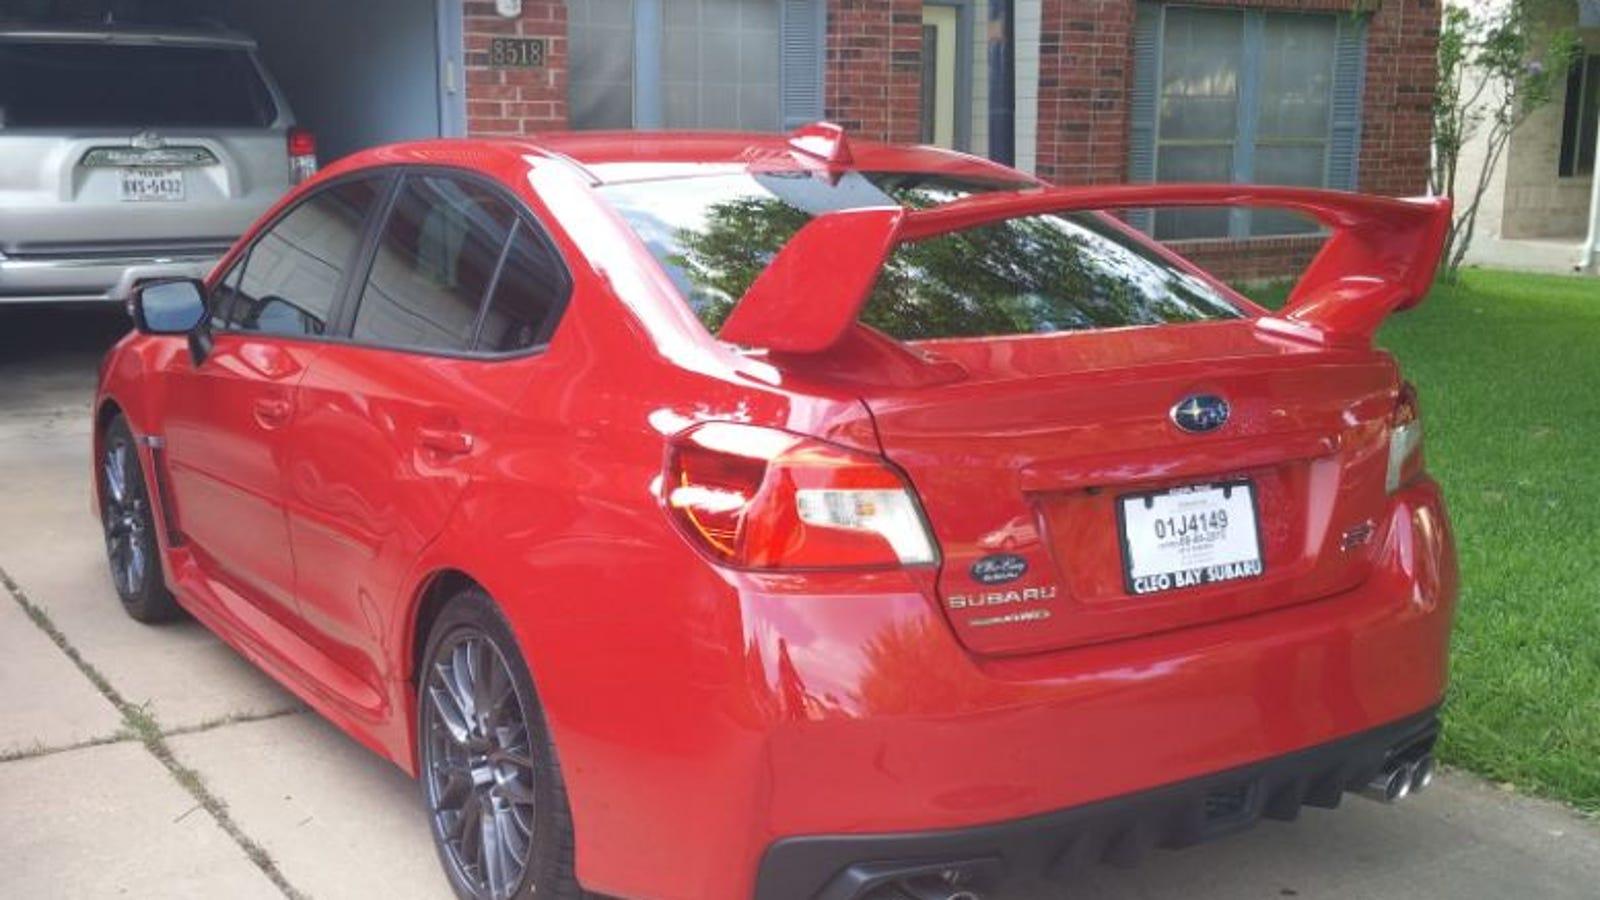 Corpus Christi Subaru >> Corpus Christi Subaru Damaged My Subaru A Psa